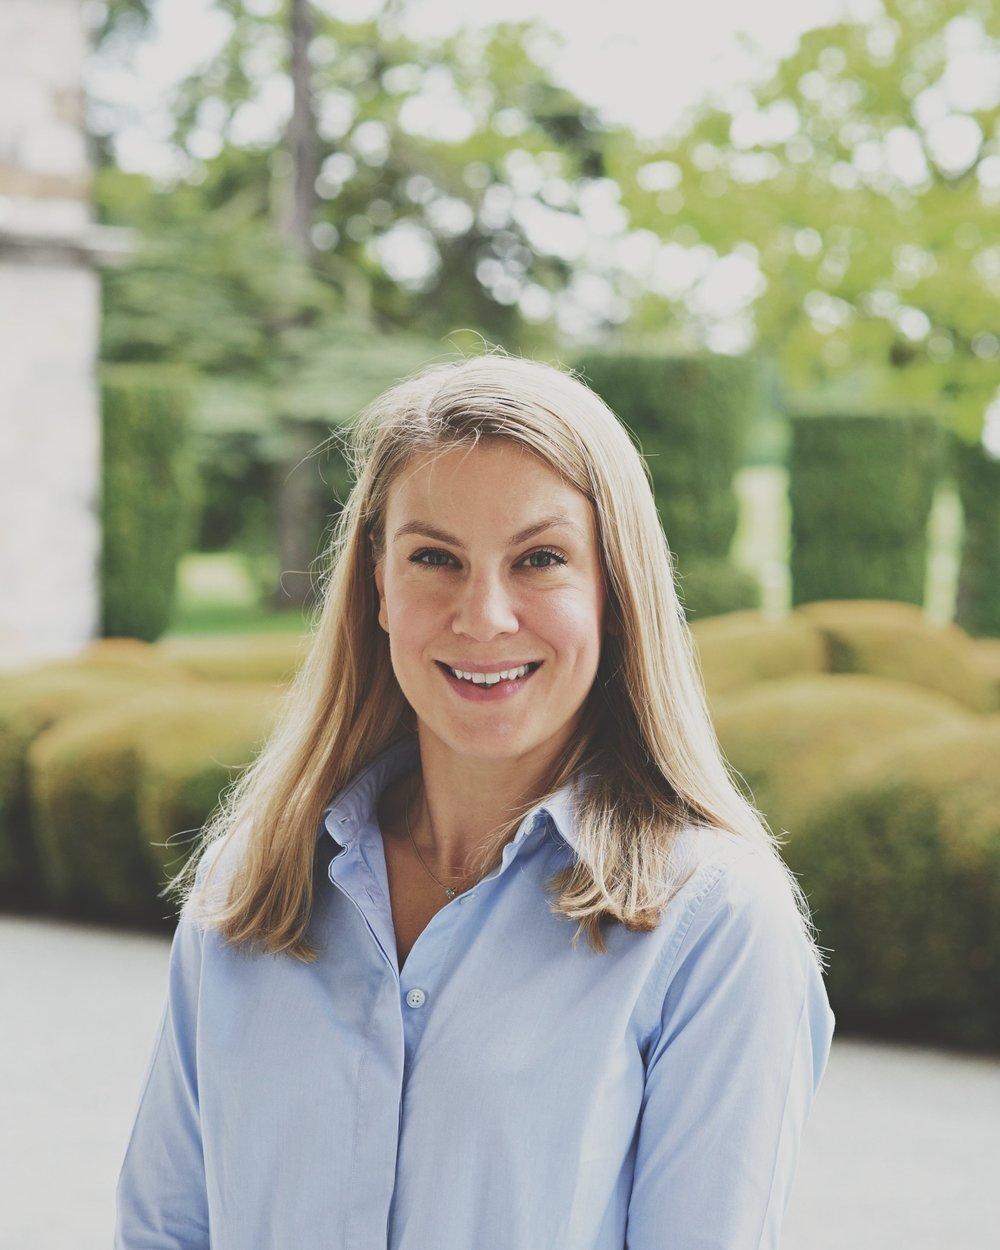 Rebecca Nordstrom-Manna - OFFICE & HR MANAGEROffice: London, UKrebecca@highlandeurope.com+44 207 183 4325